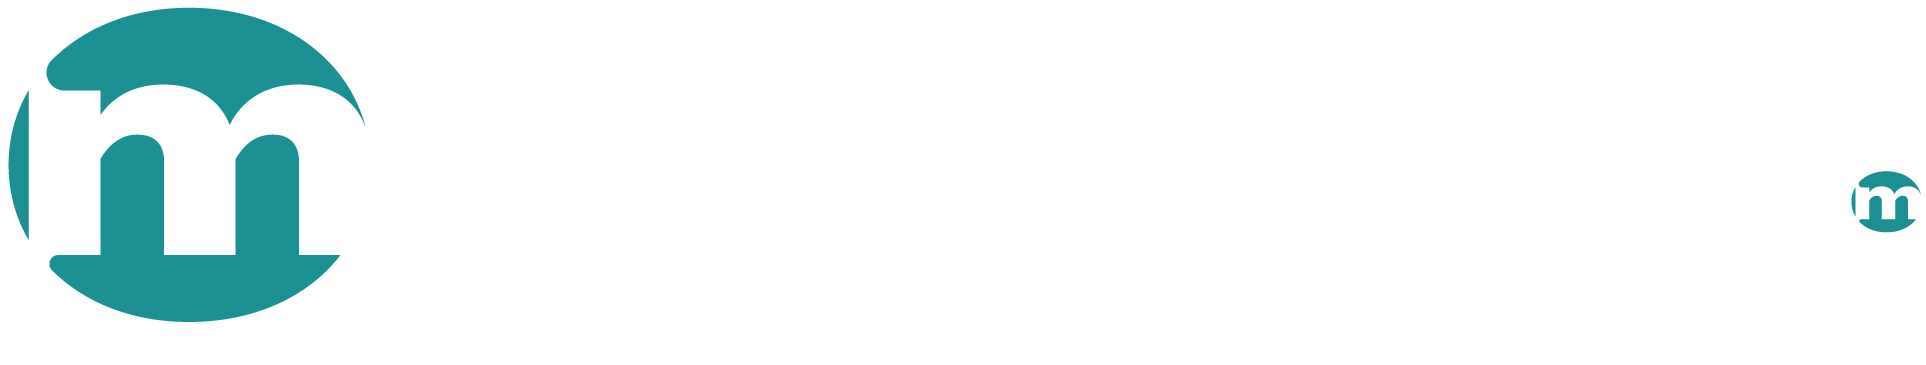 Modular Engineering